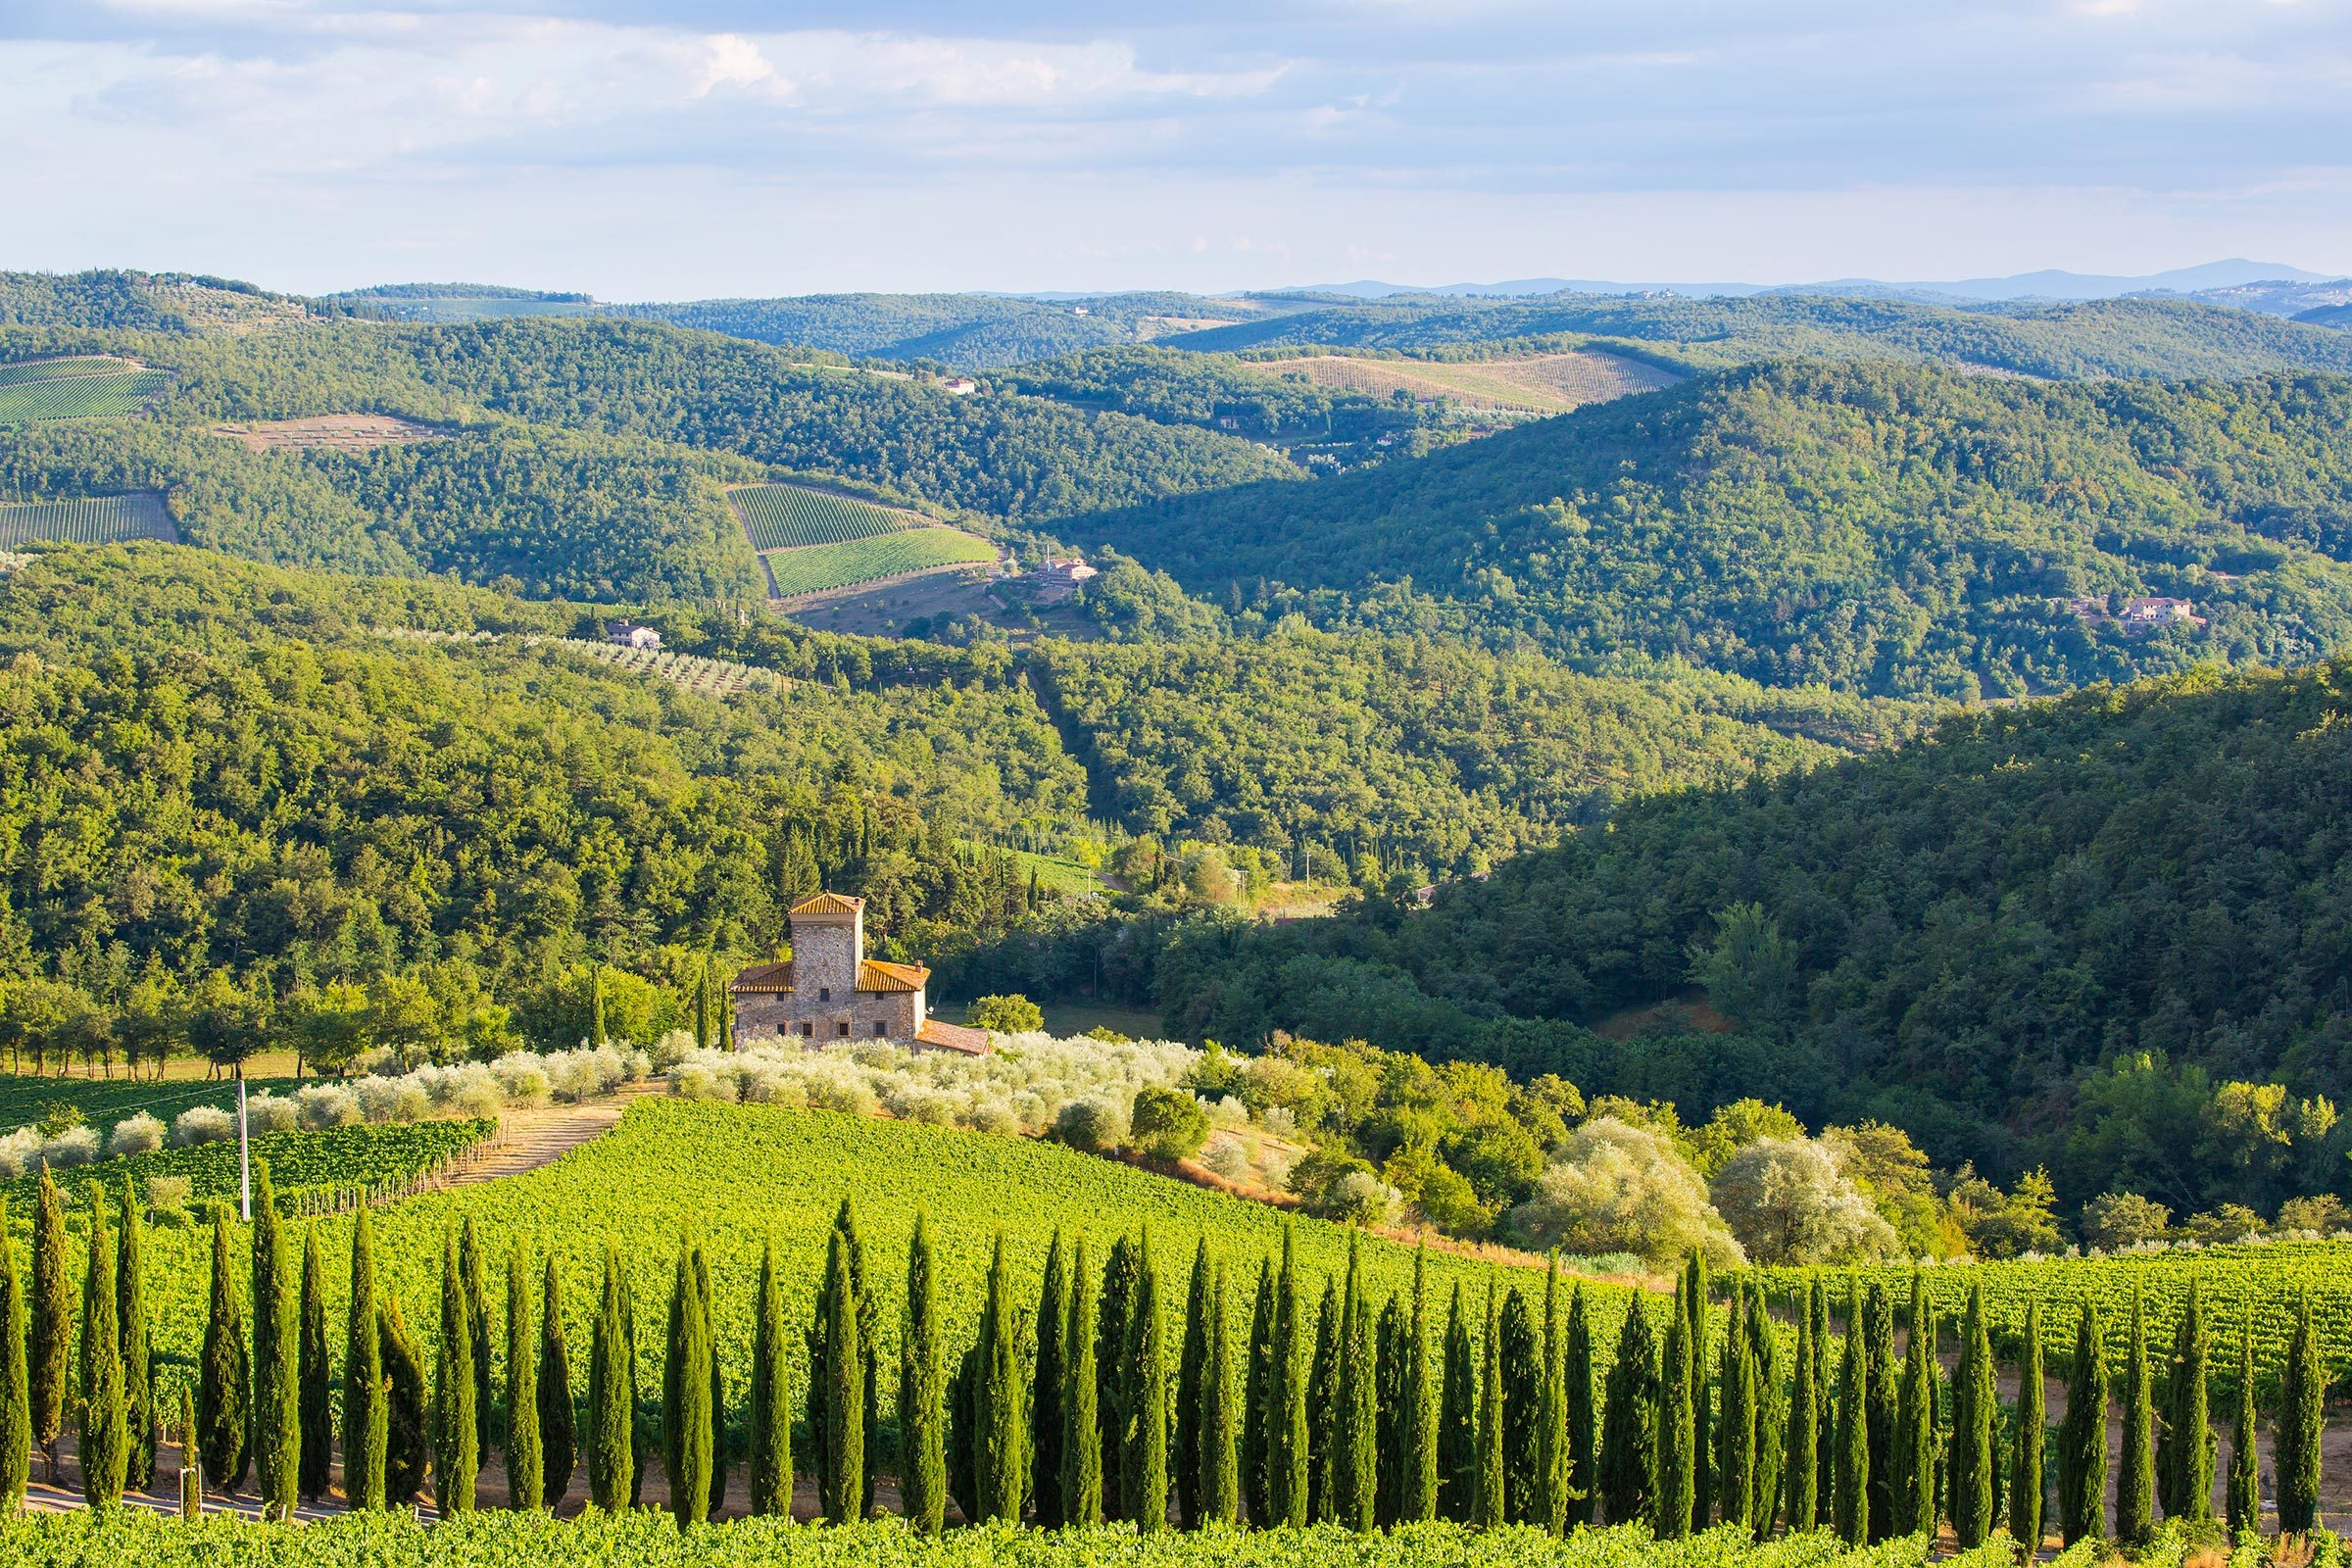 Siena province, Italy - August 6, 2016: Vineyards of the Castello di Albola estate in the Chianti region.